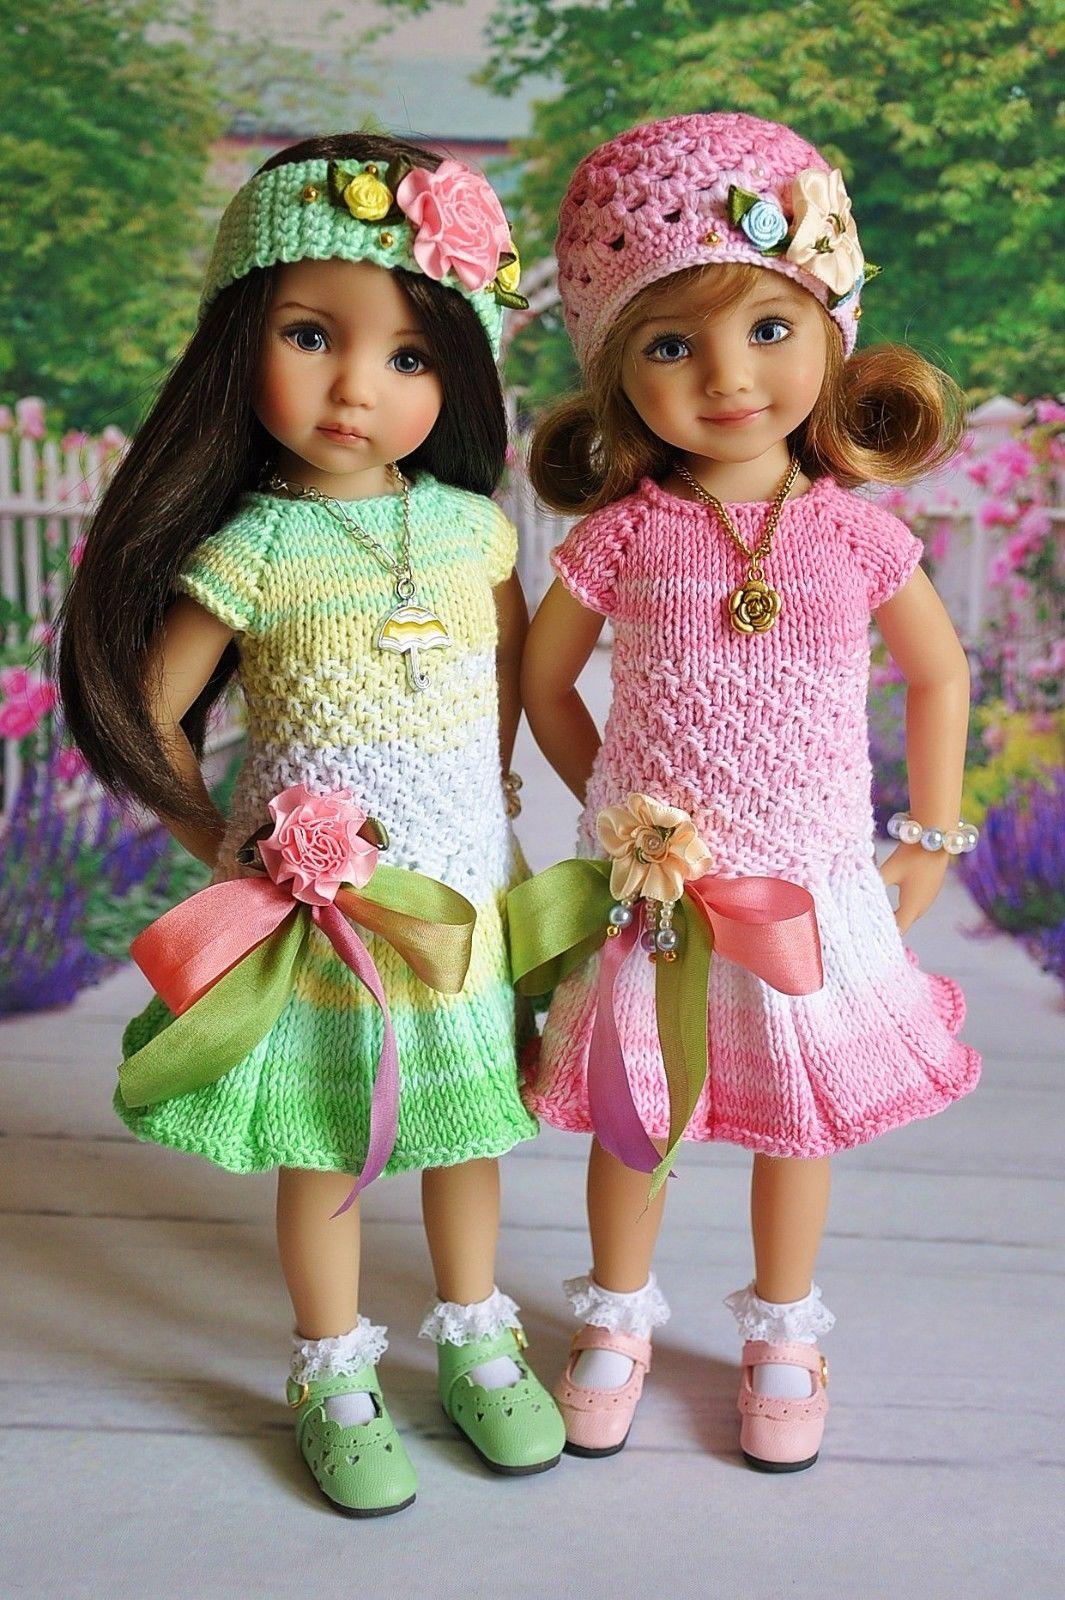 4 530,54 руб. New in Куклы и мягкие игрушки, Куклы, Одежда и аксессуары